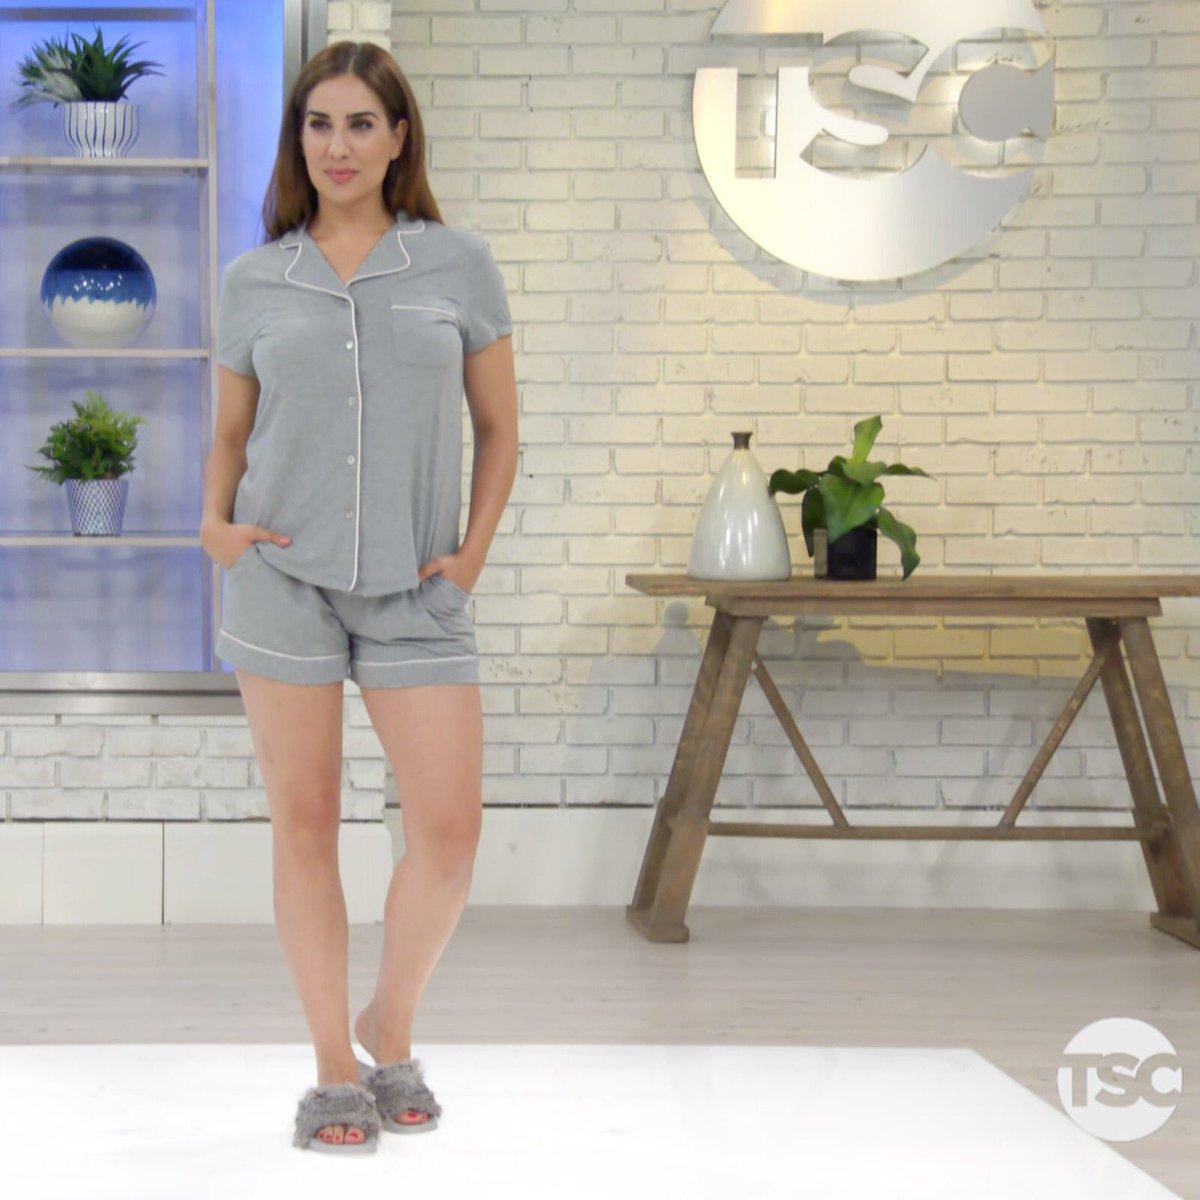 50b420377911c  lusome  nightgown  sleepwear  sexysleepwear  theshoppingchannel  yyz  yyc   canadian  canadianbrand  salepic.twitter.com 3BZf16vT76